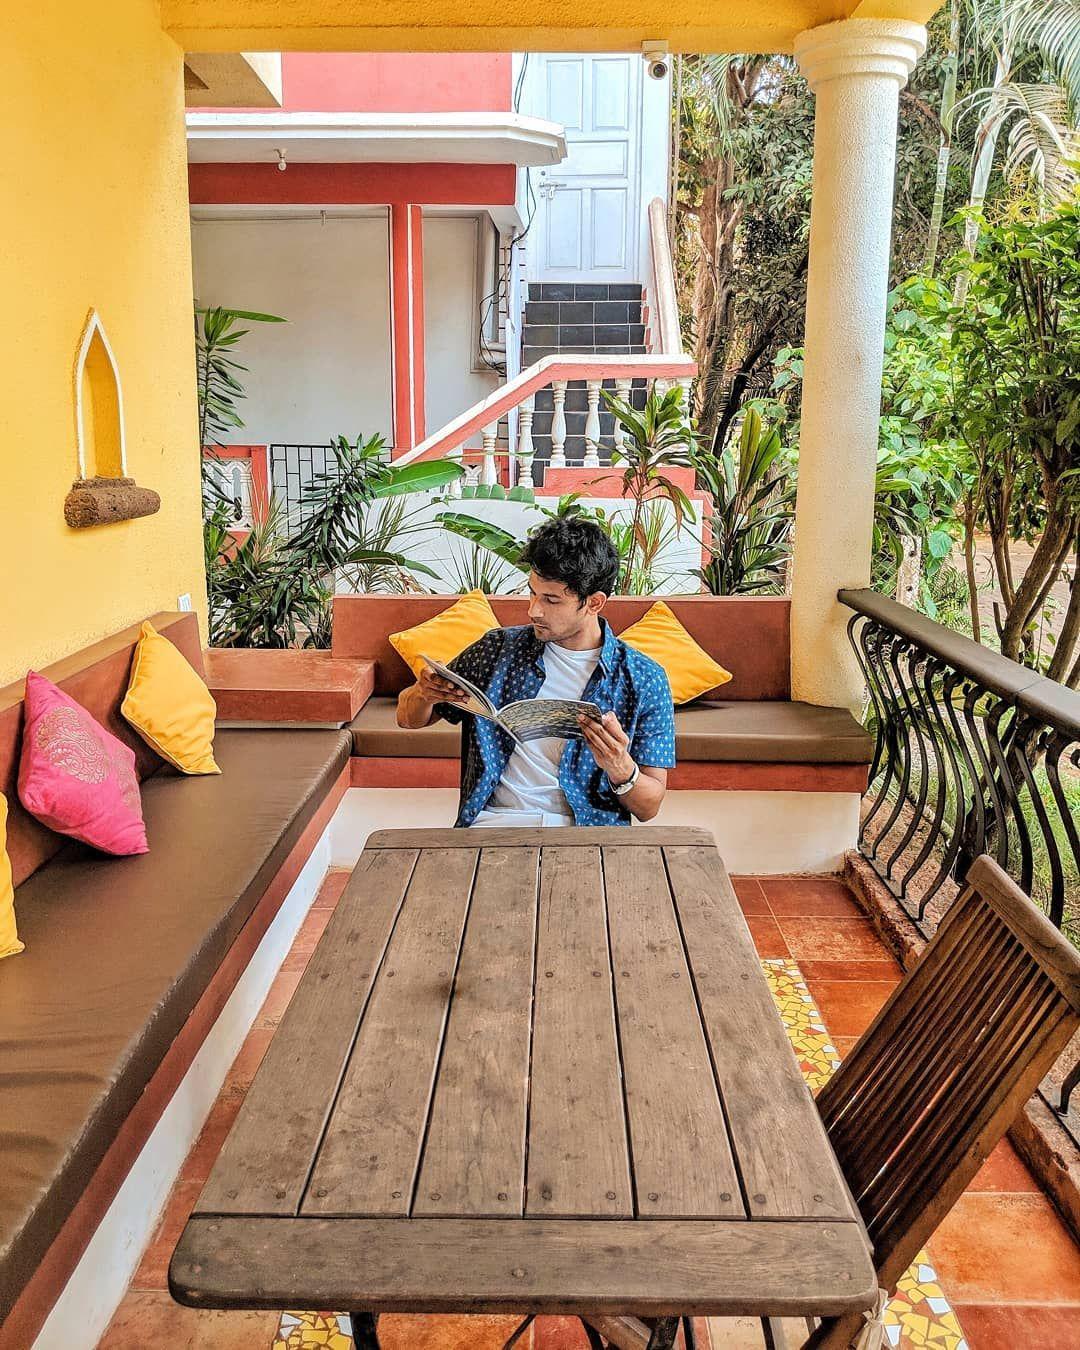 Superhost @rainforest.talisman making my midweek blues more colourful 😋      #goa #goaindia #indiatourism #goatourism #travelblogger #indiantravelblogger #colourful #candolim #goabeaches #calangut #midweekblues #goavillas #villasforrent #rentalvillas